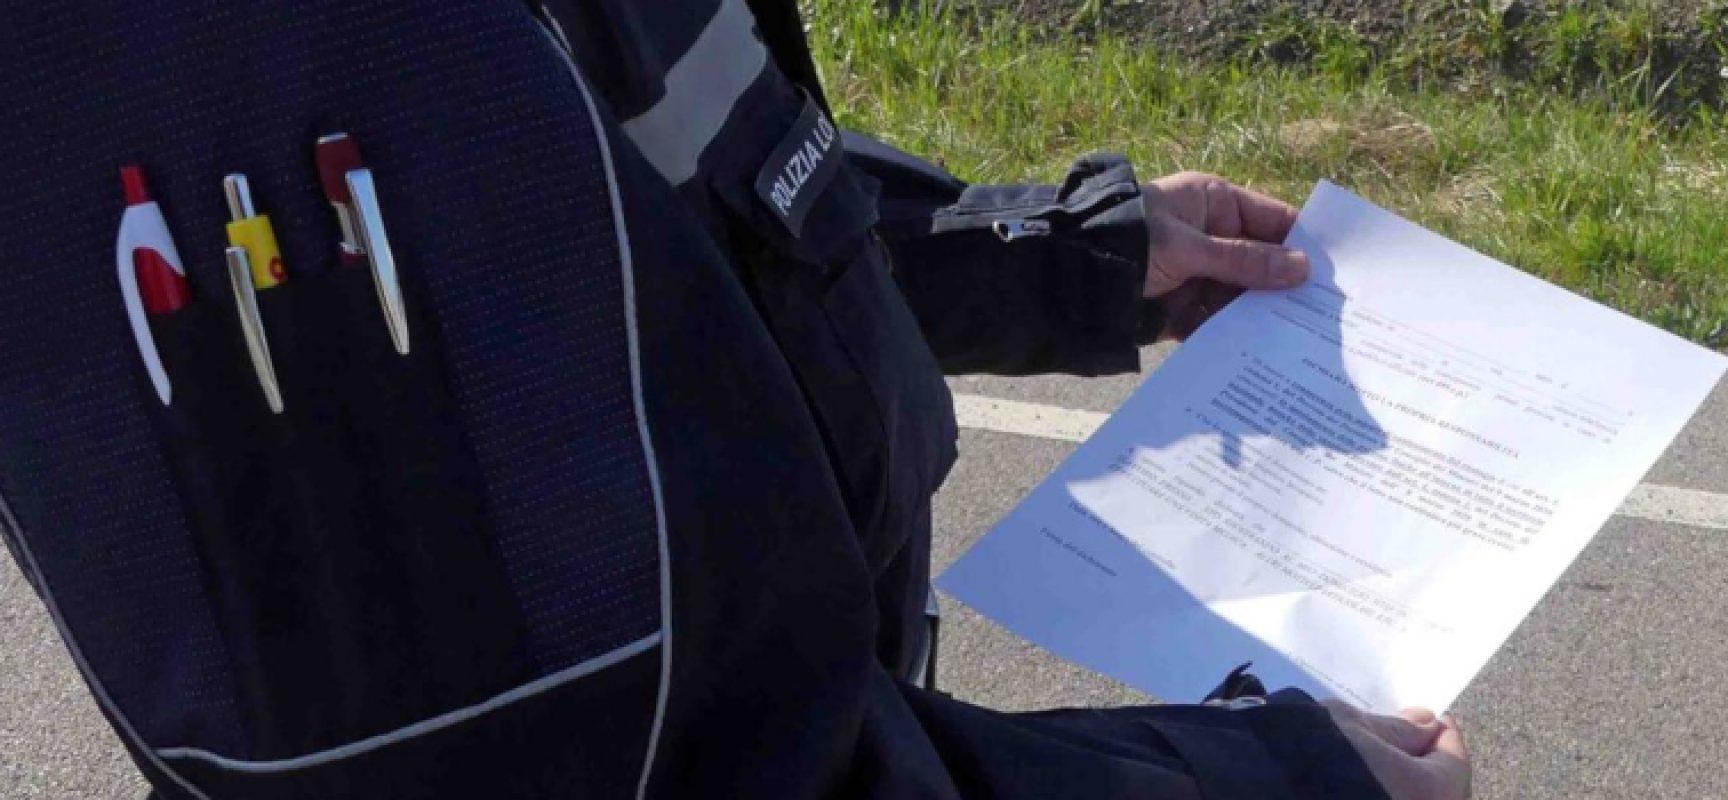 Certificazione verde Covid-19 per gli spostamenti fra regioni / DETTAGLI